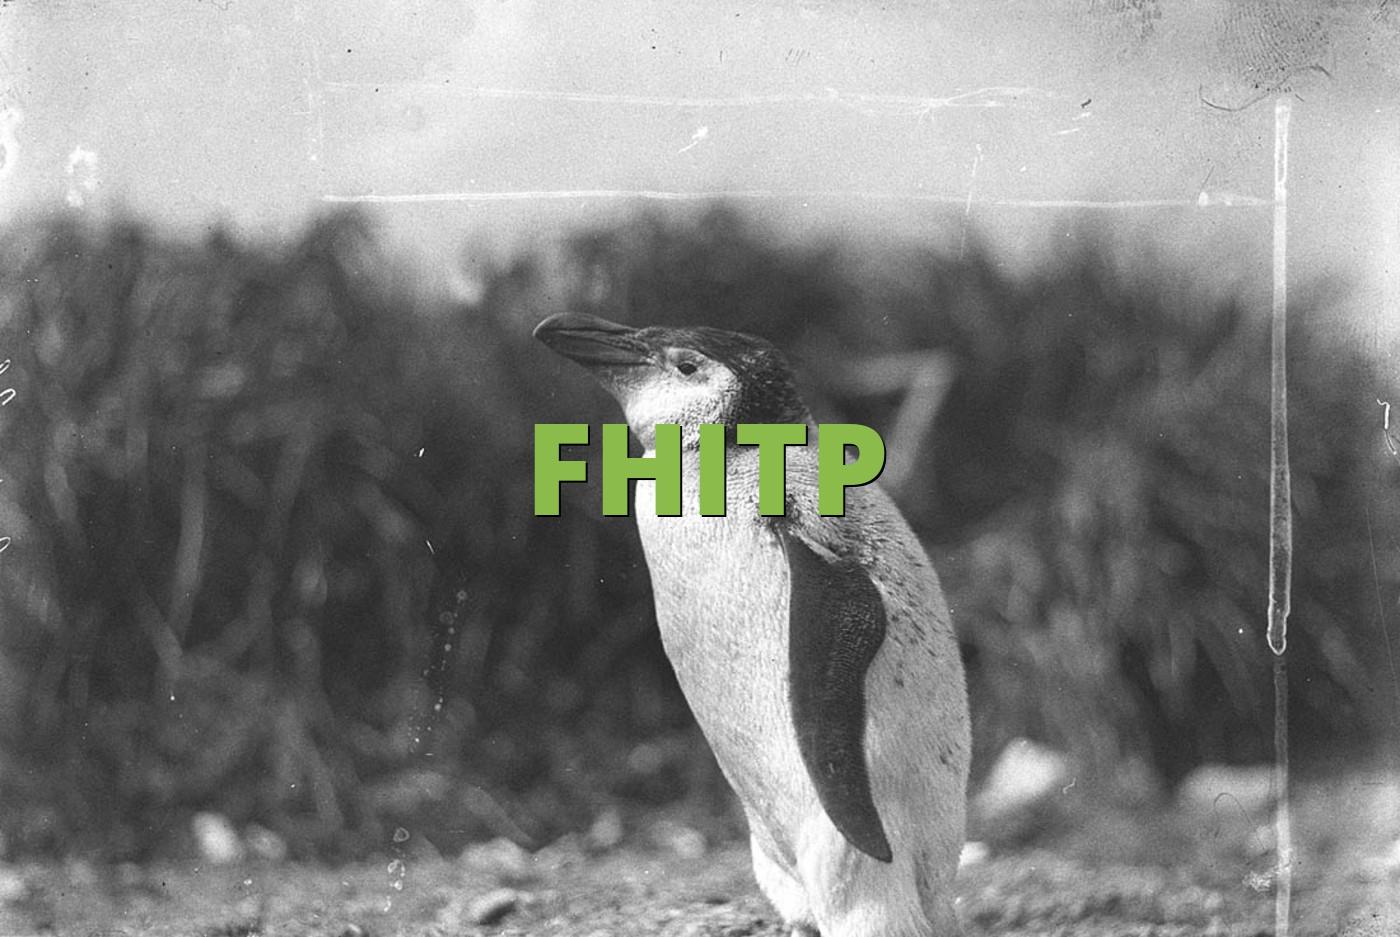 FHITP